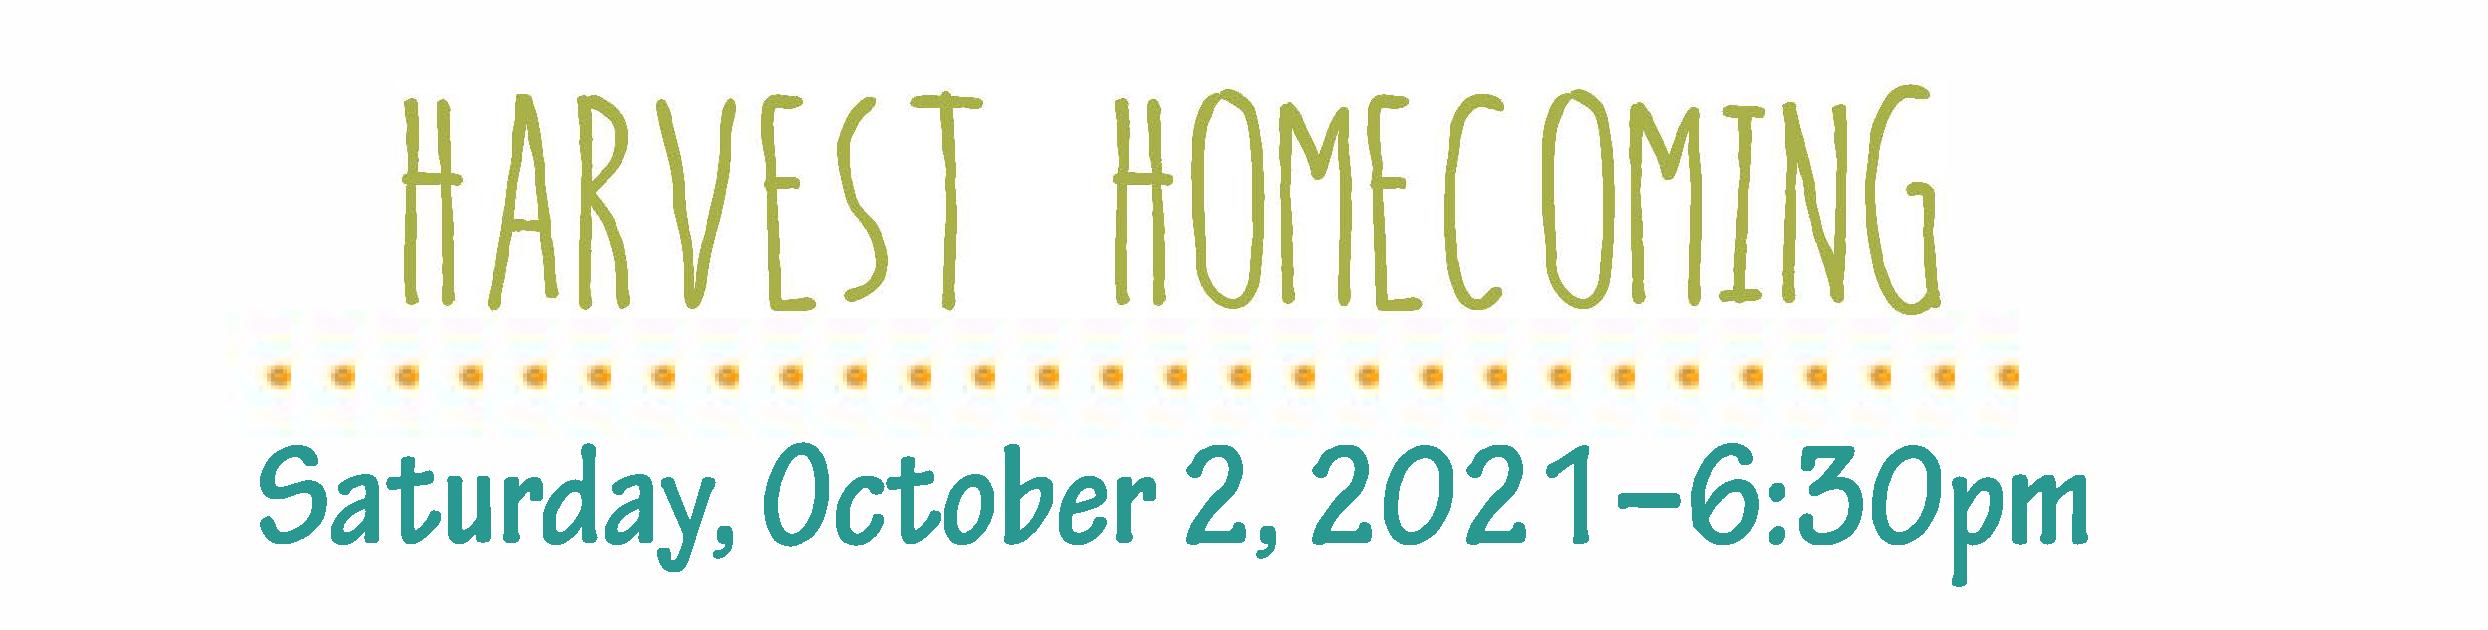 harvest homecoming header